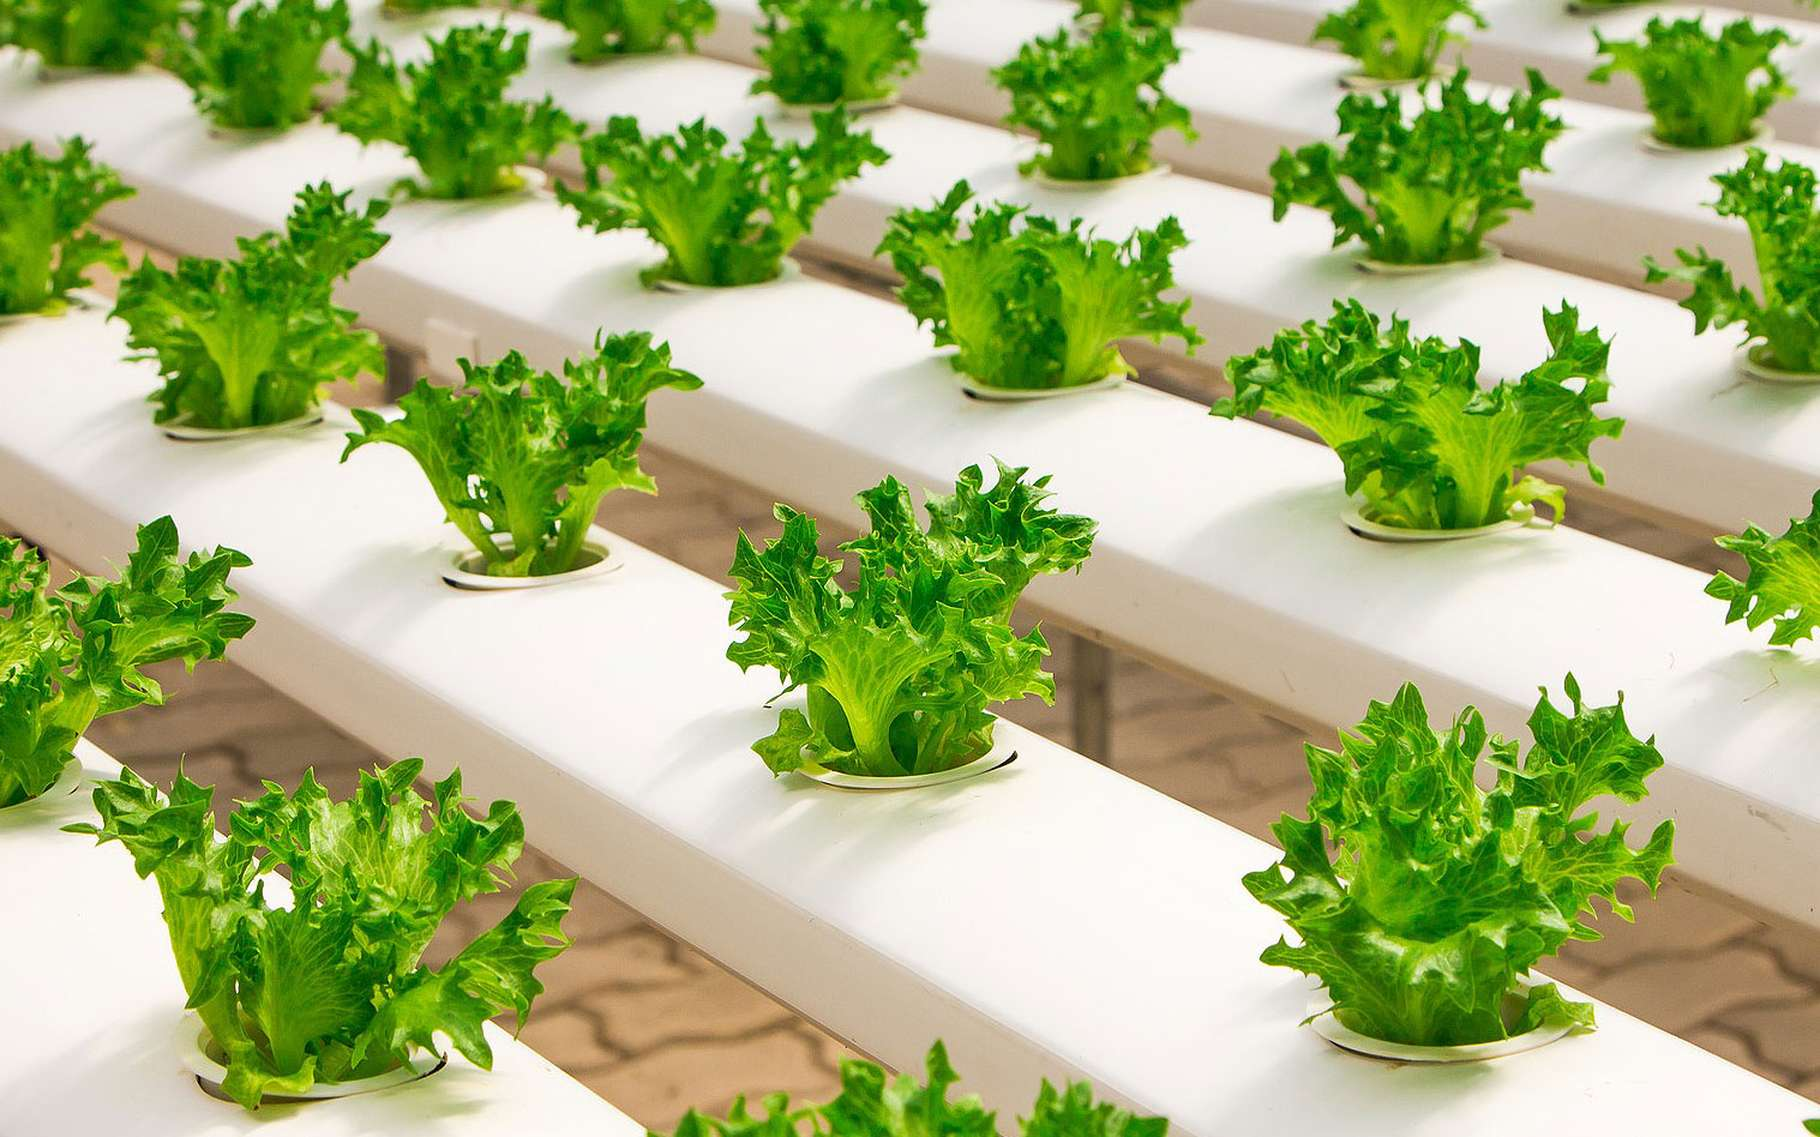 Un semis de salades. © Naidokdin, Pixabay